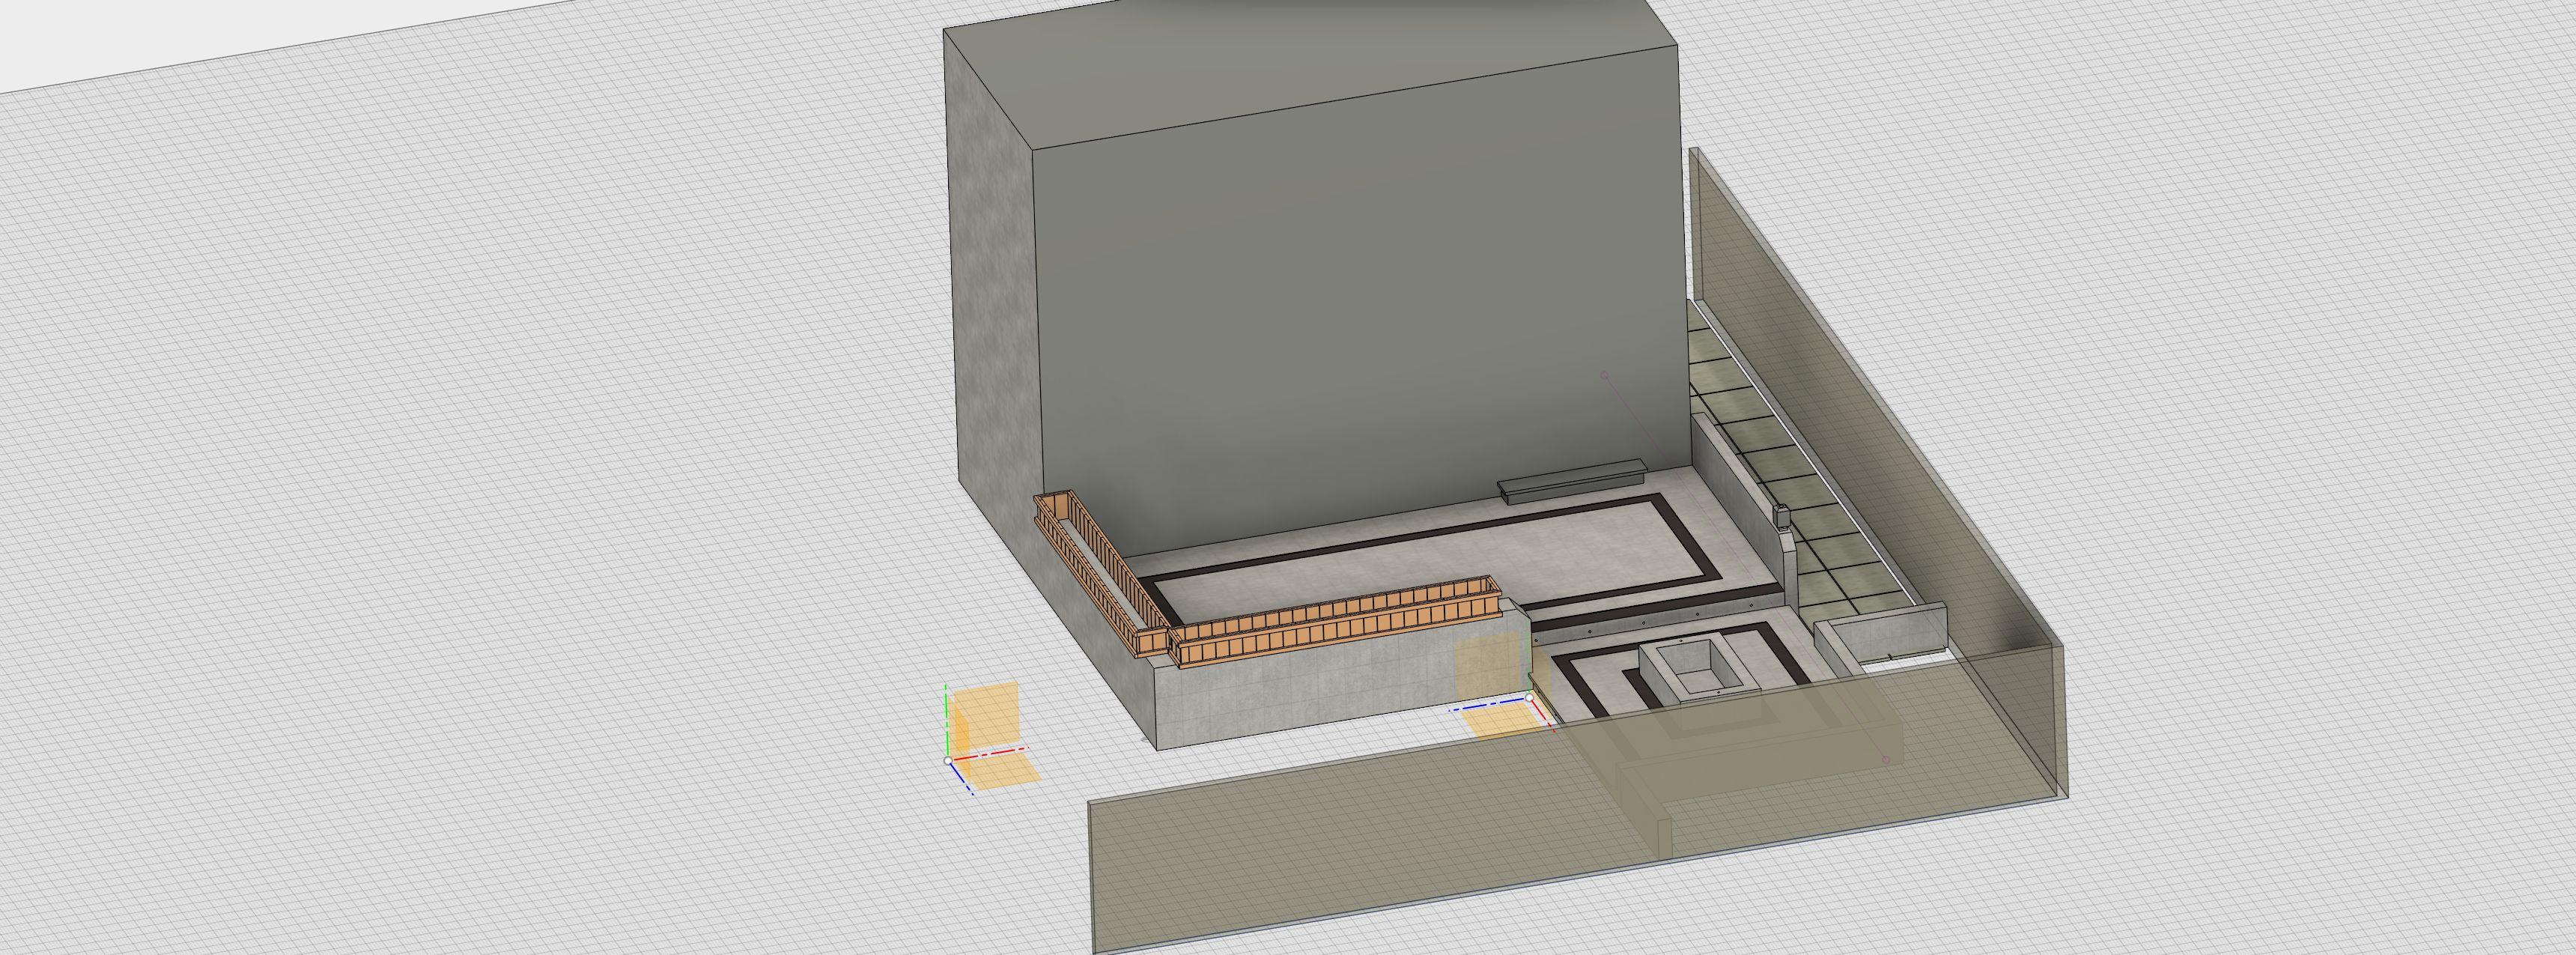 Backyard Patio Design Autodesk Online Gallery